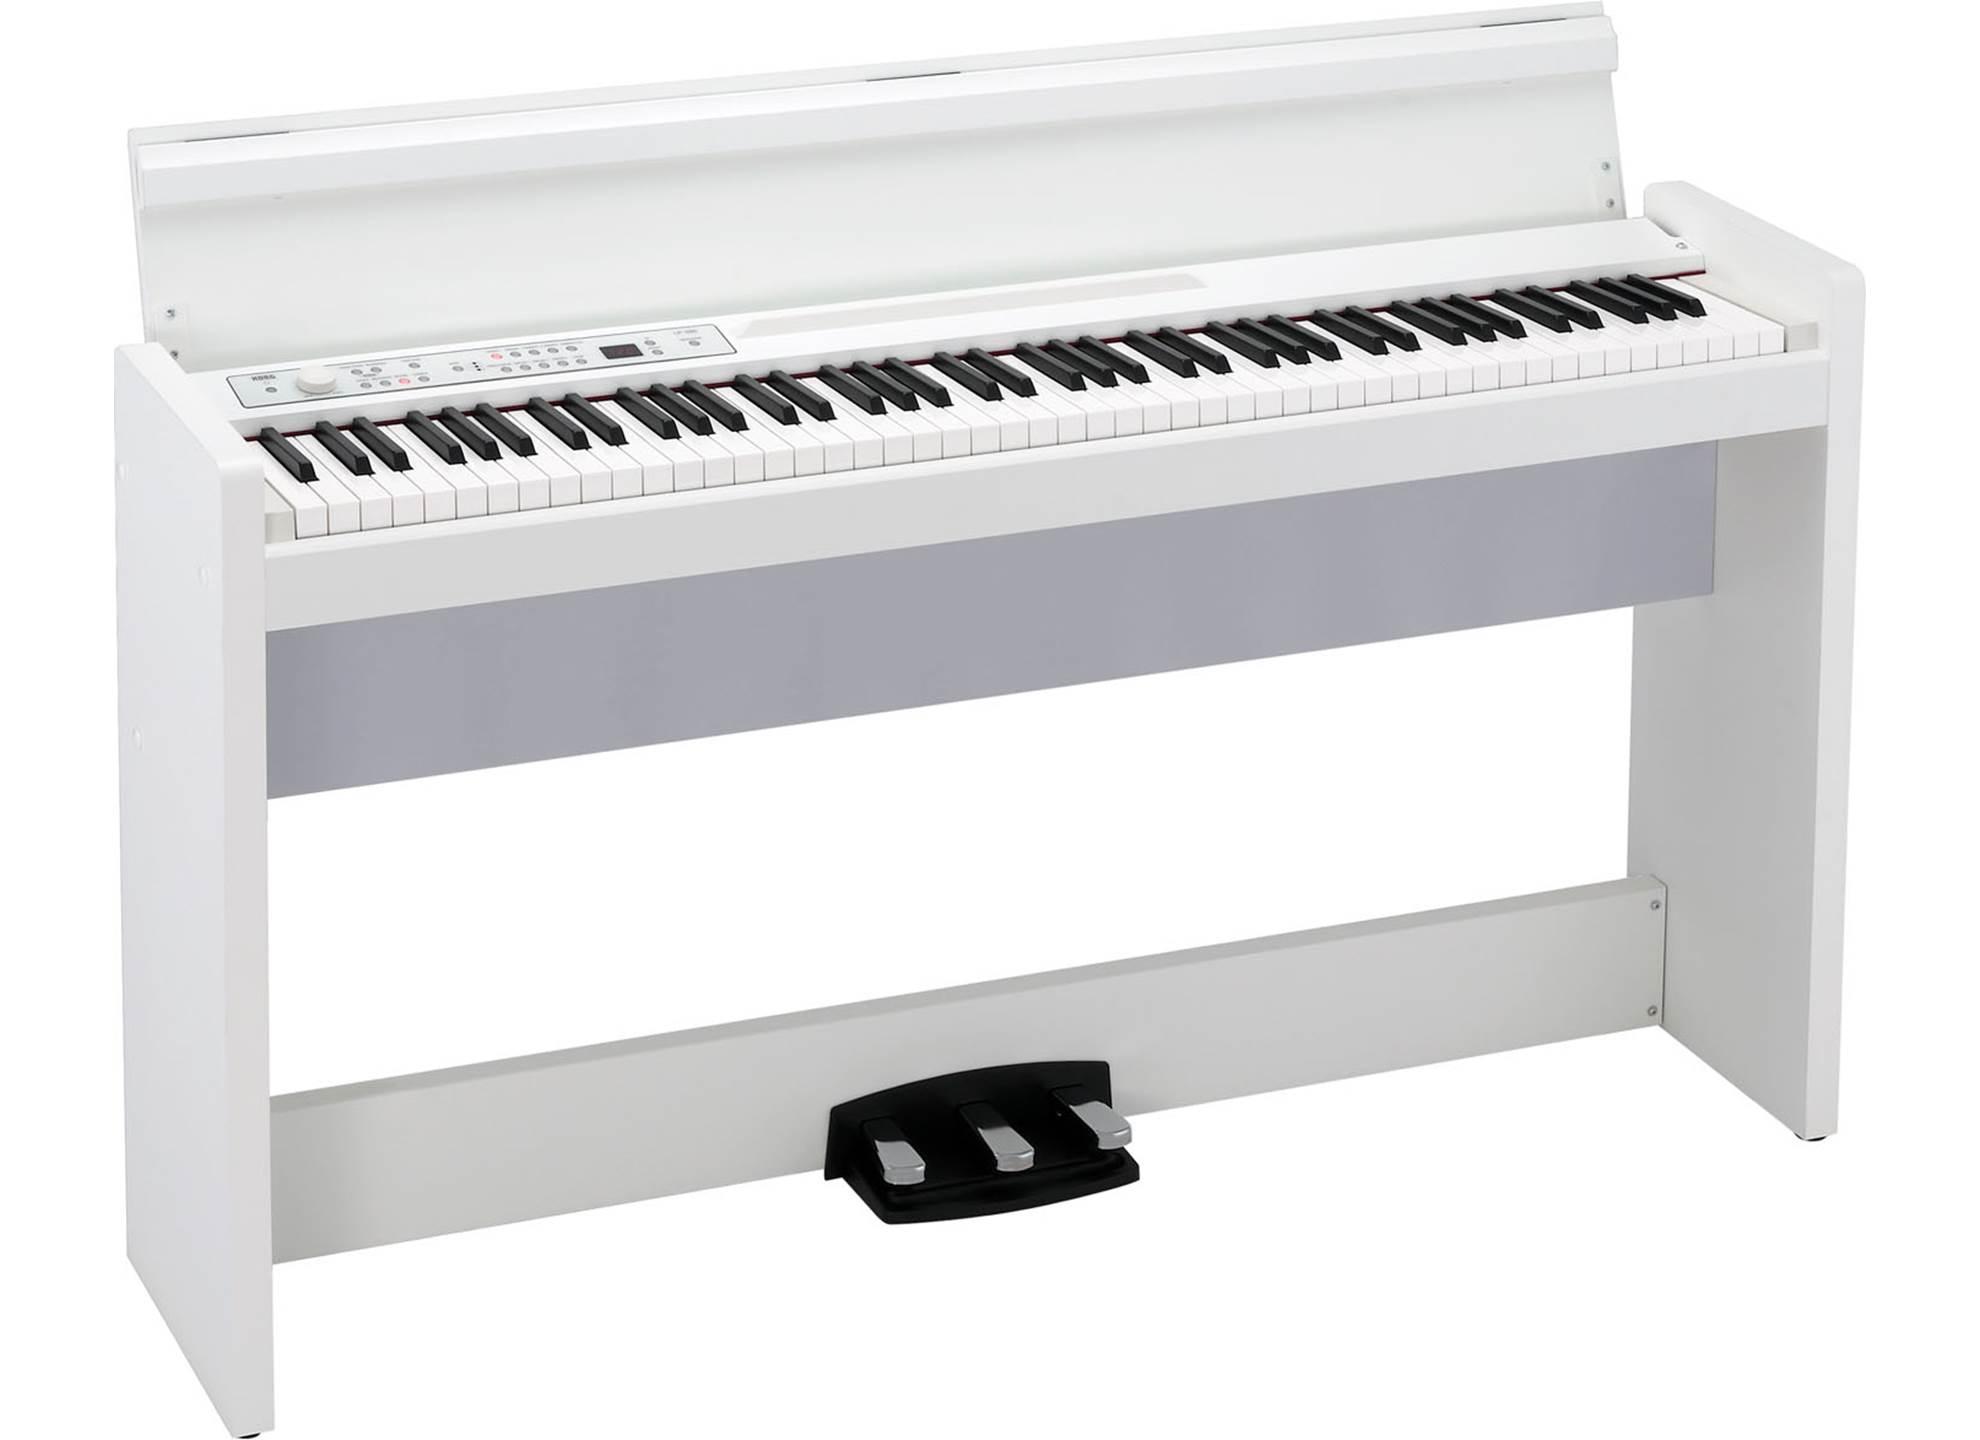 LP-380U Vit